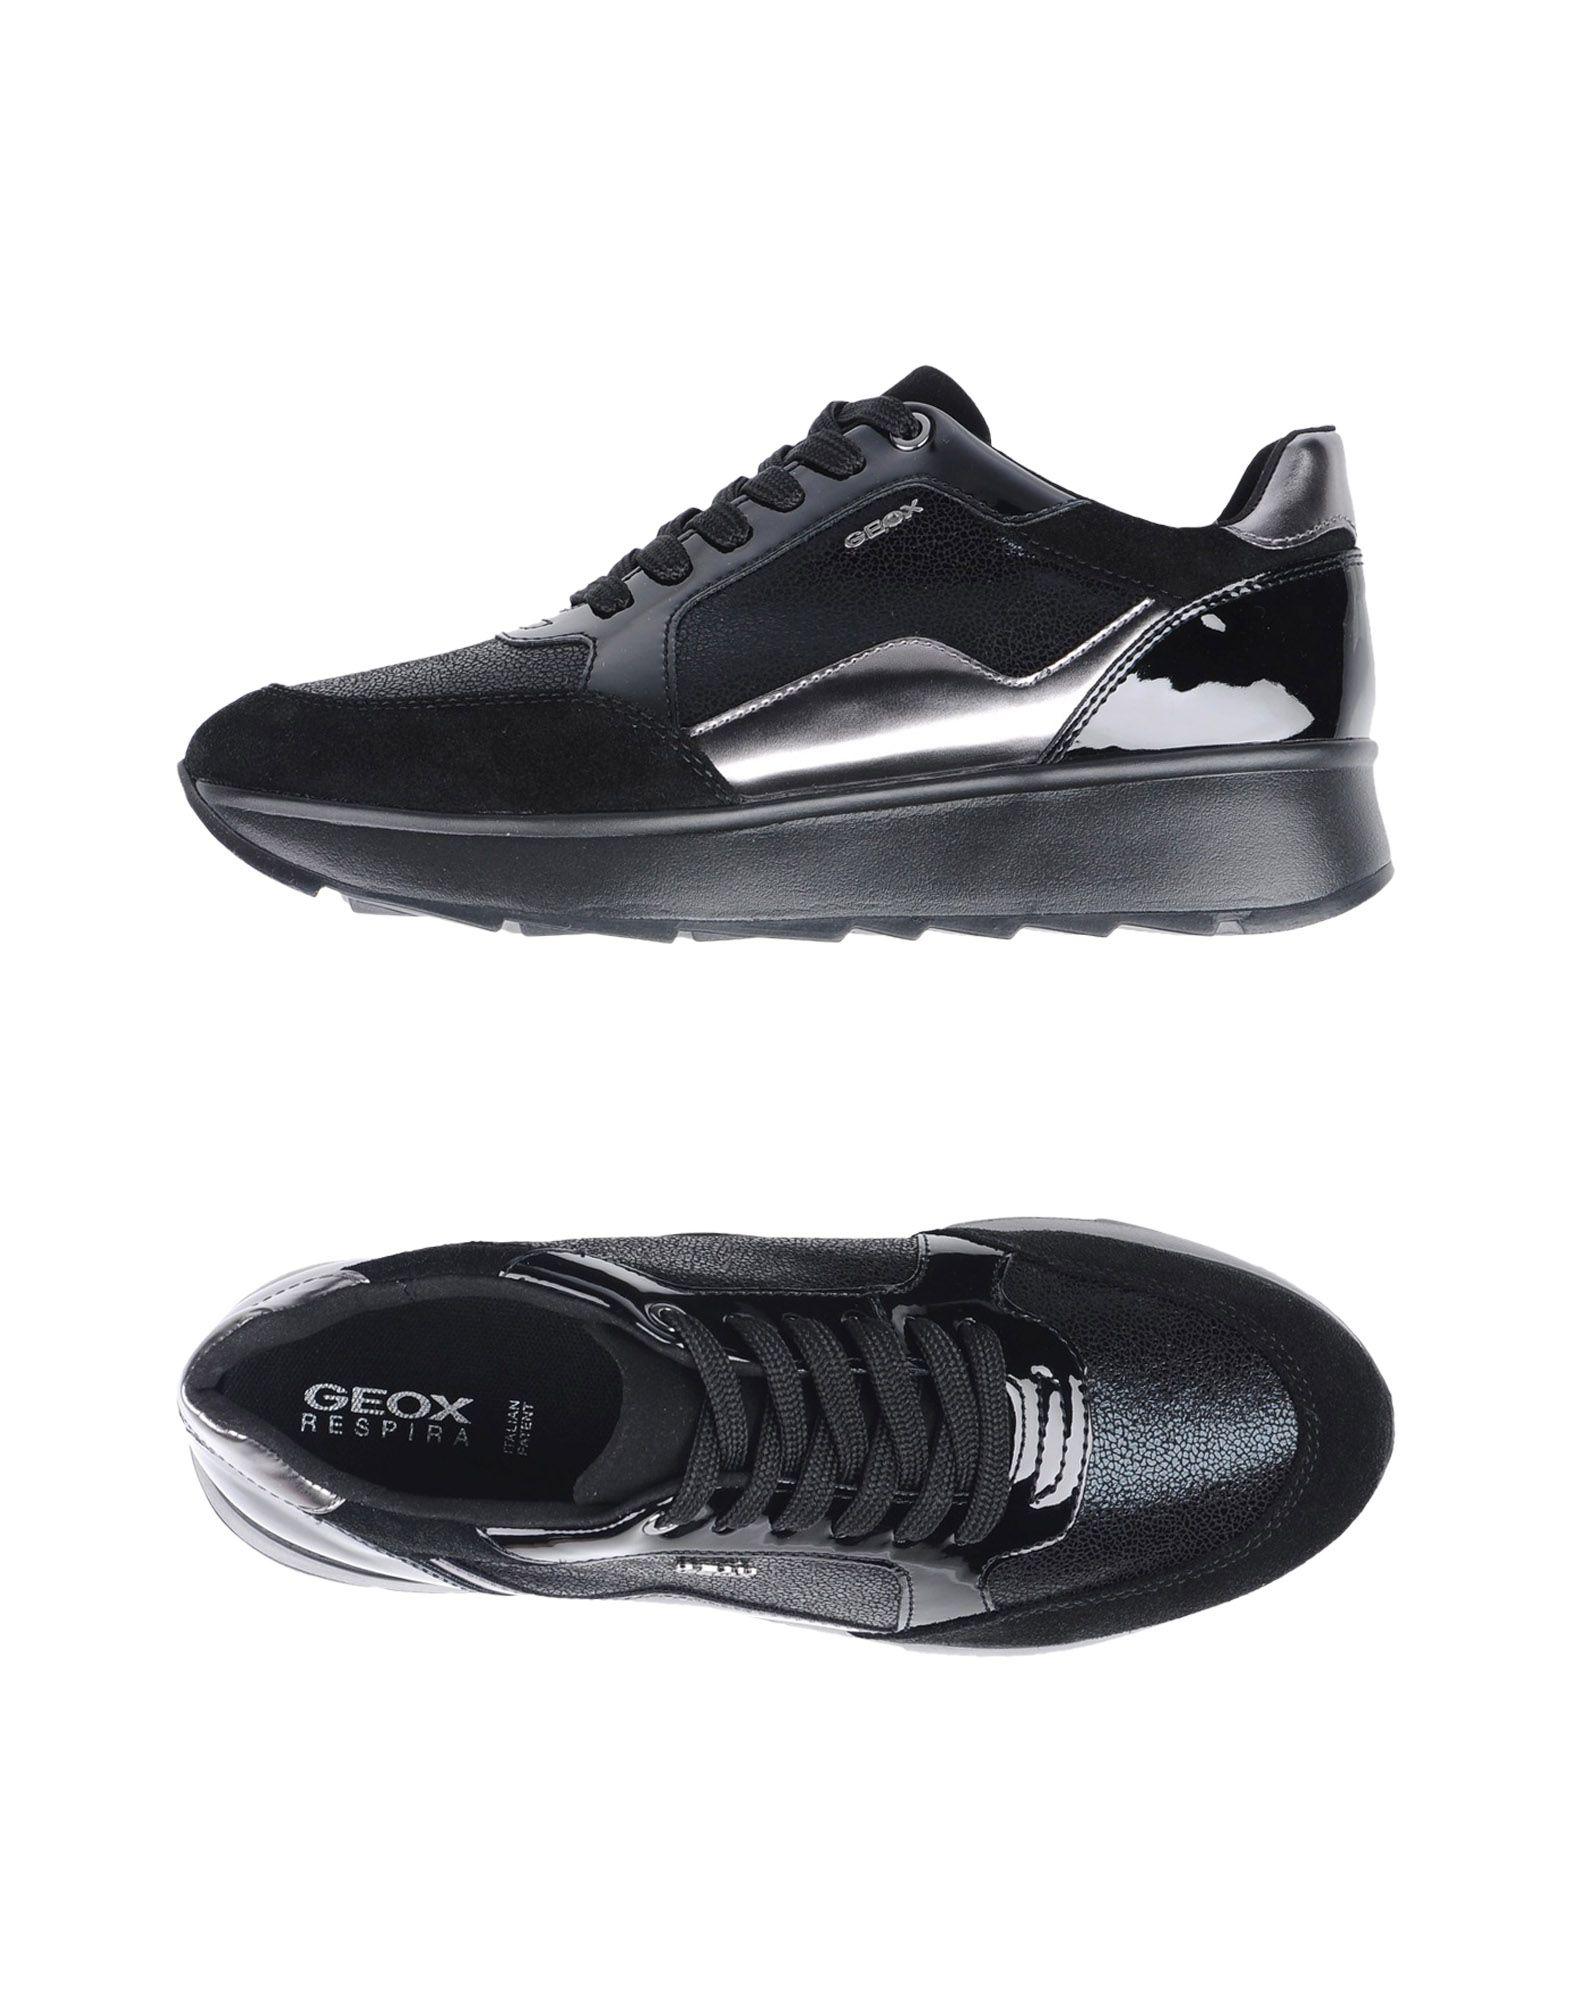 Zapatillas Geox Mujer Zapatillas - Zapatillas Mujer Geox  Negro 03a028